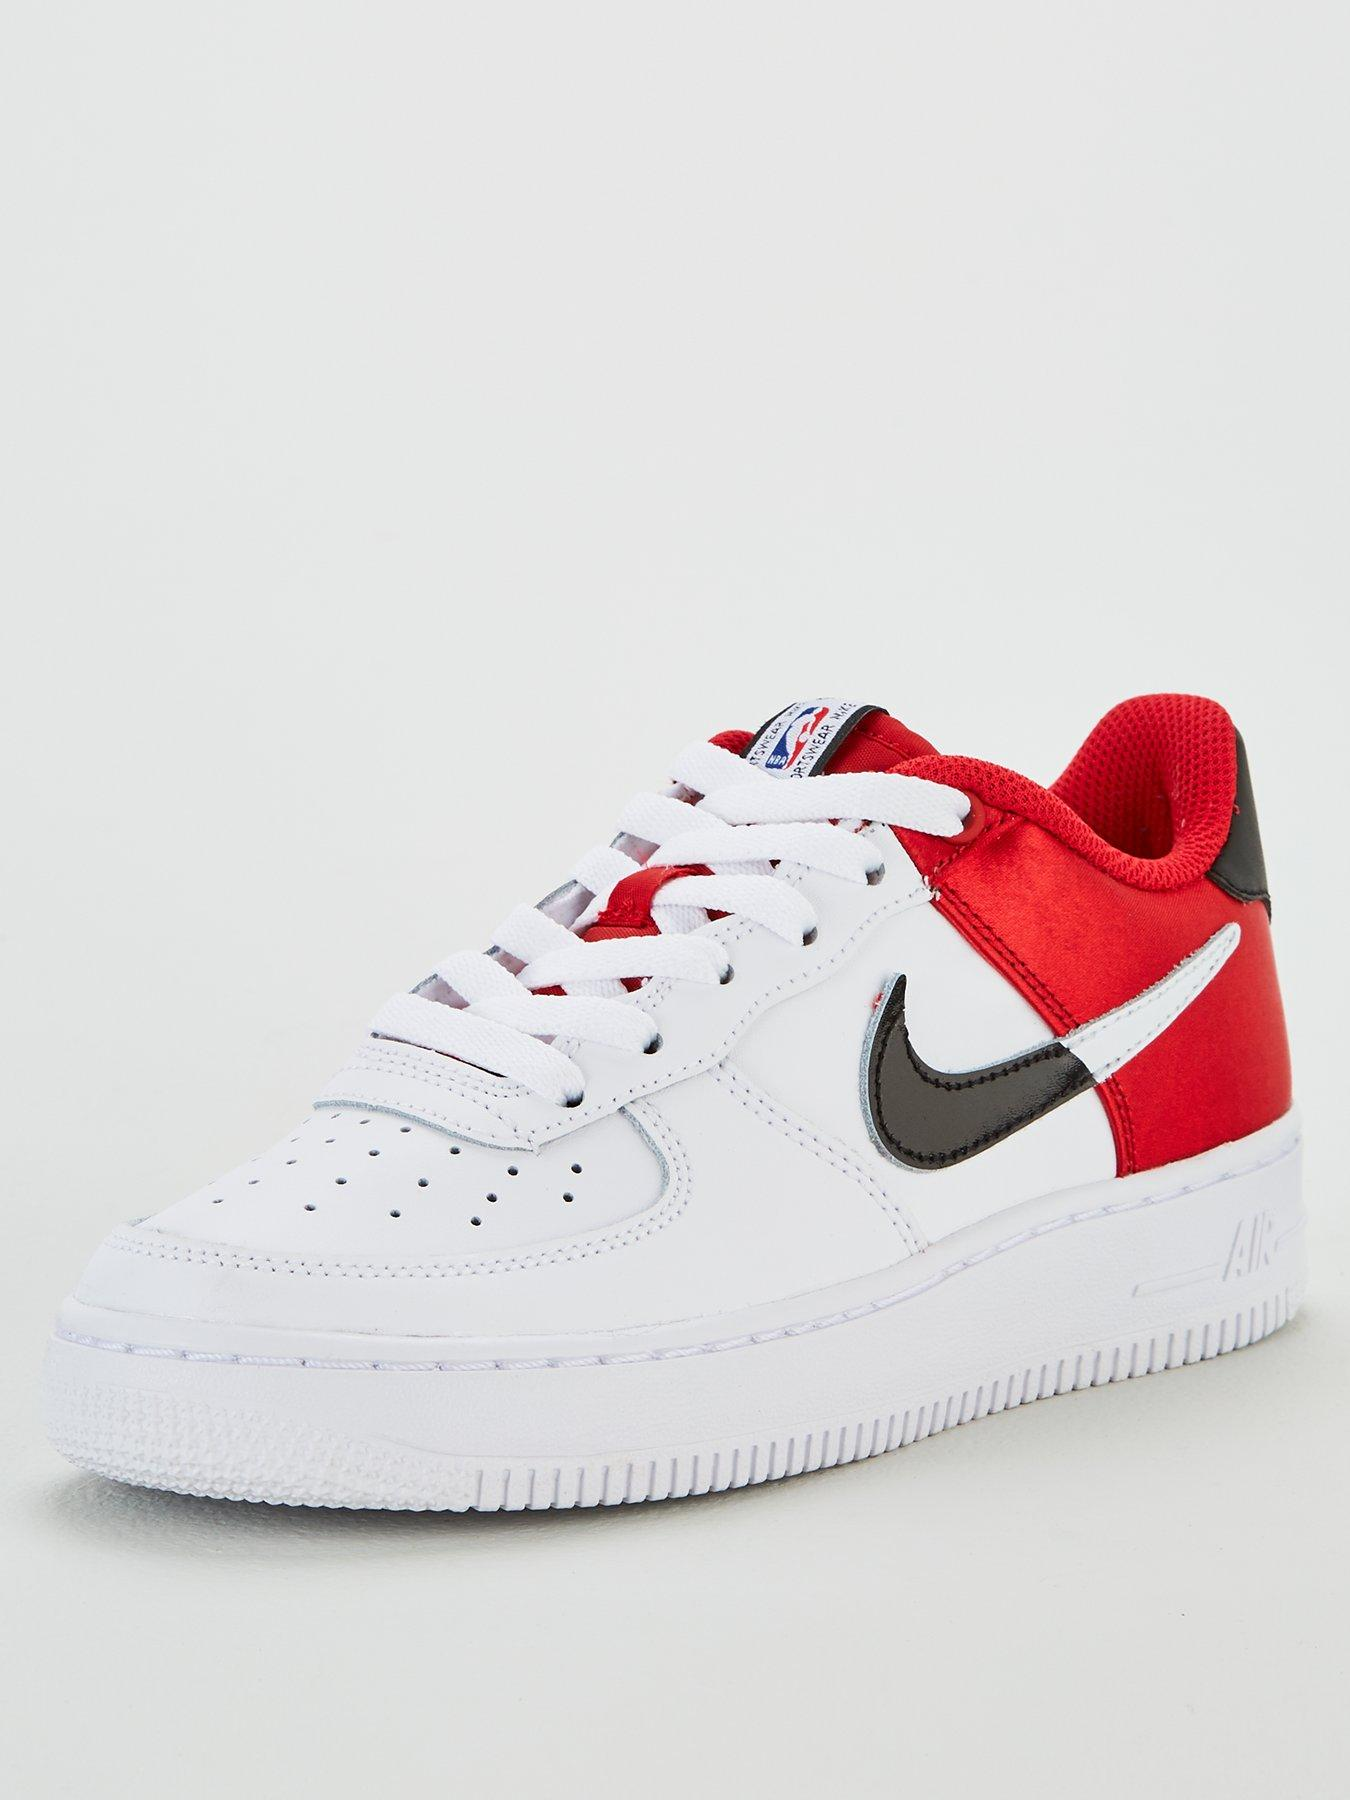 Nike Air Force 1 LV8 1 Junior Trainer